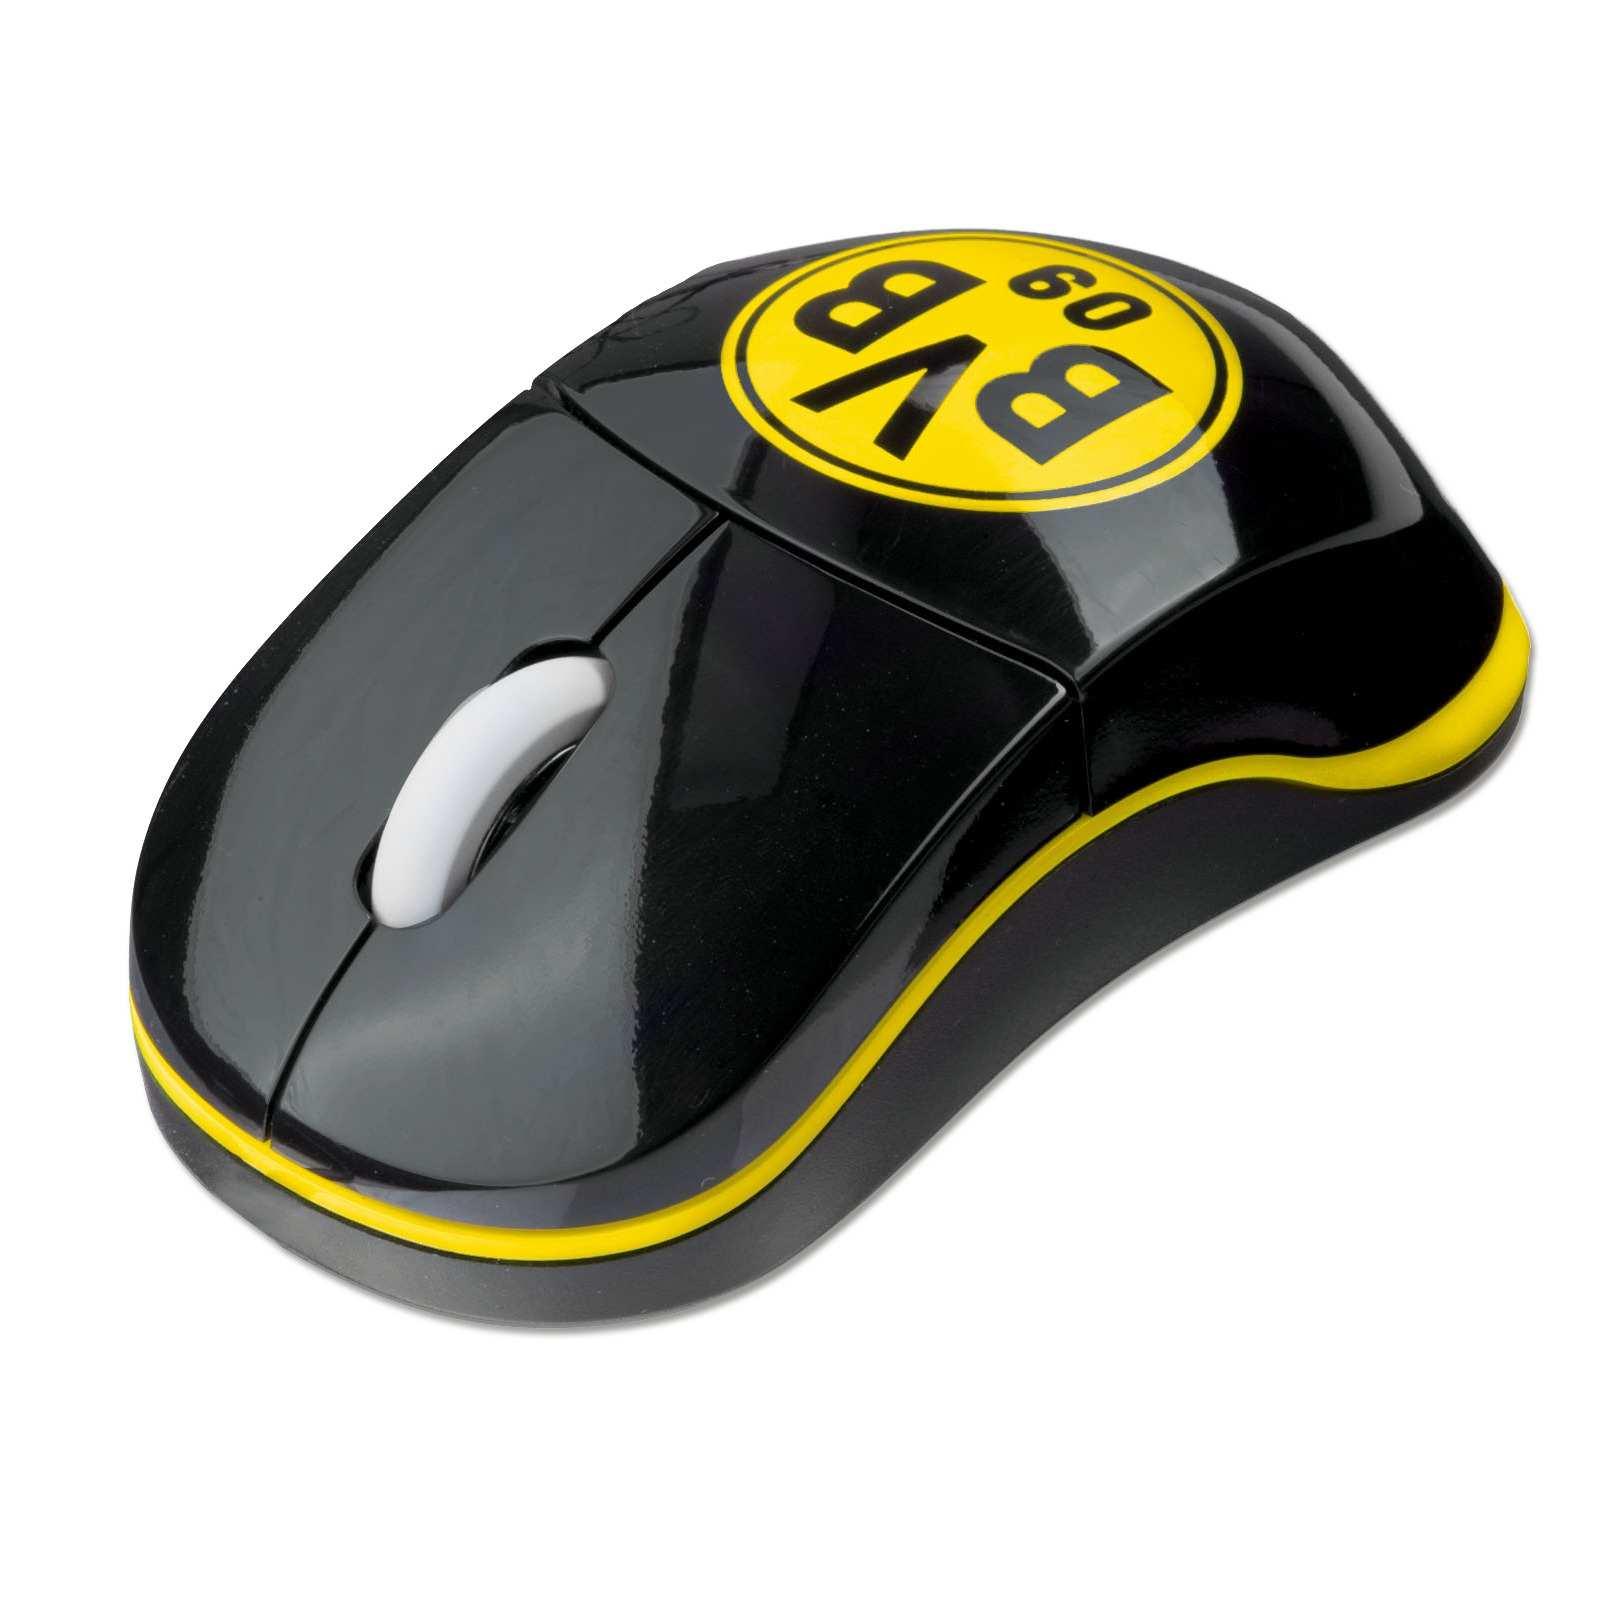 Borussia Dortmund NEU BVB-Mousepad rund